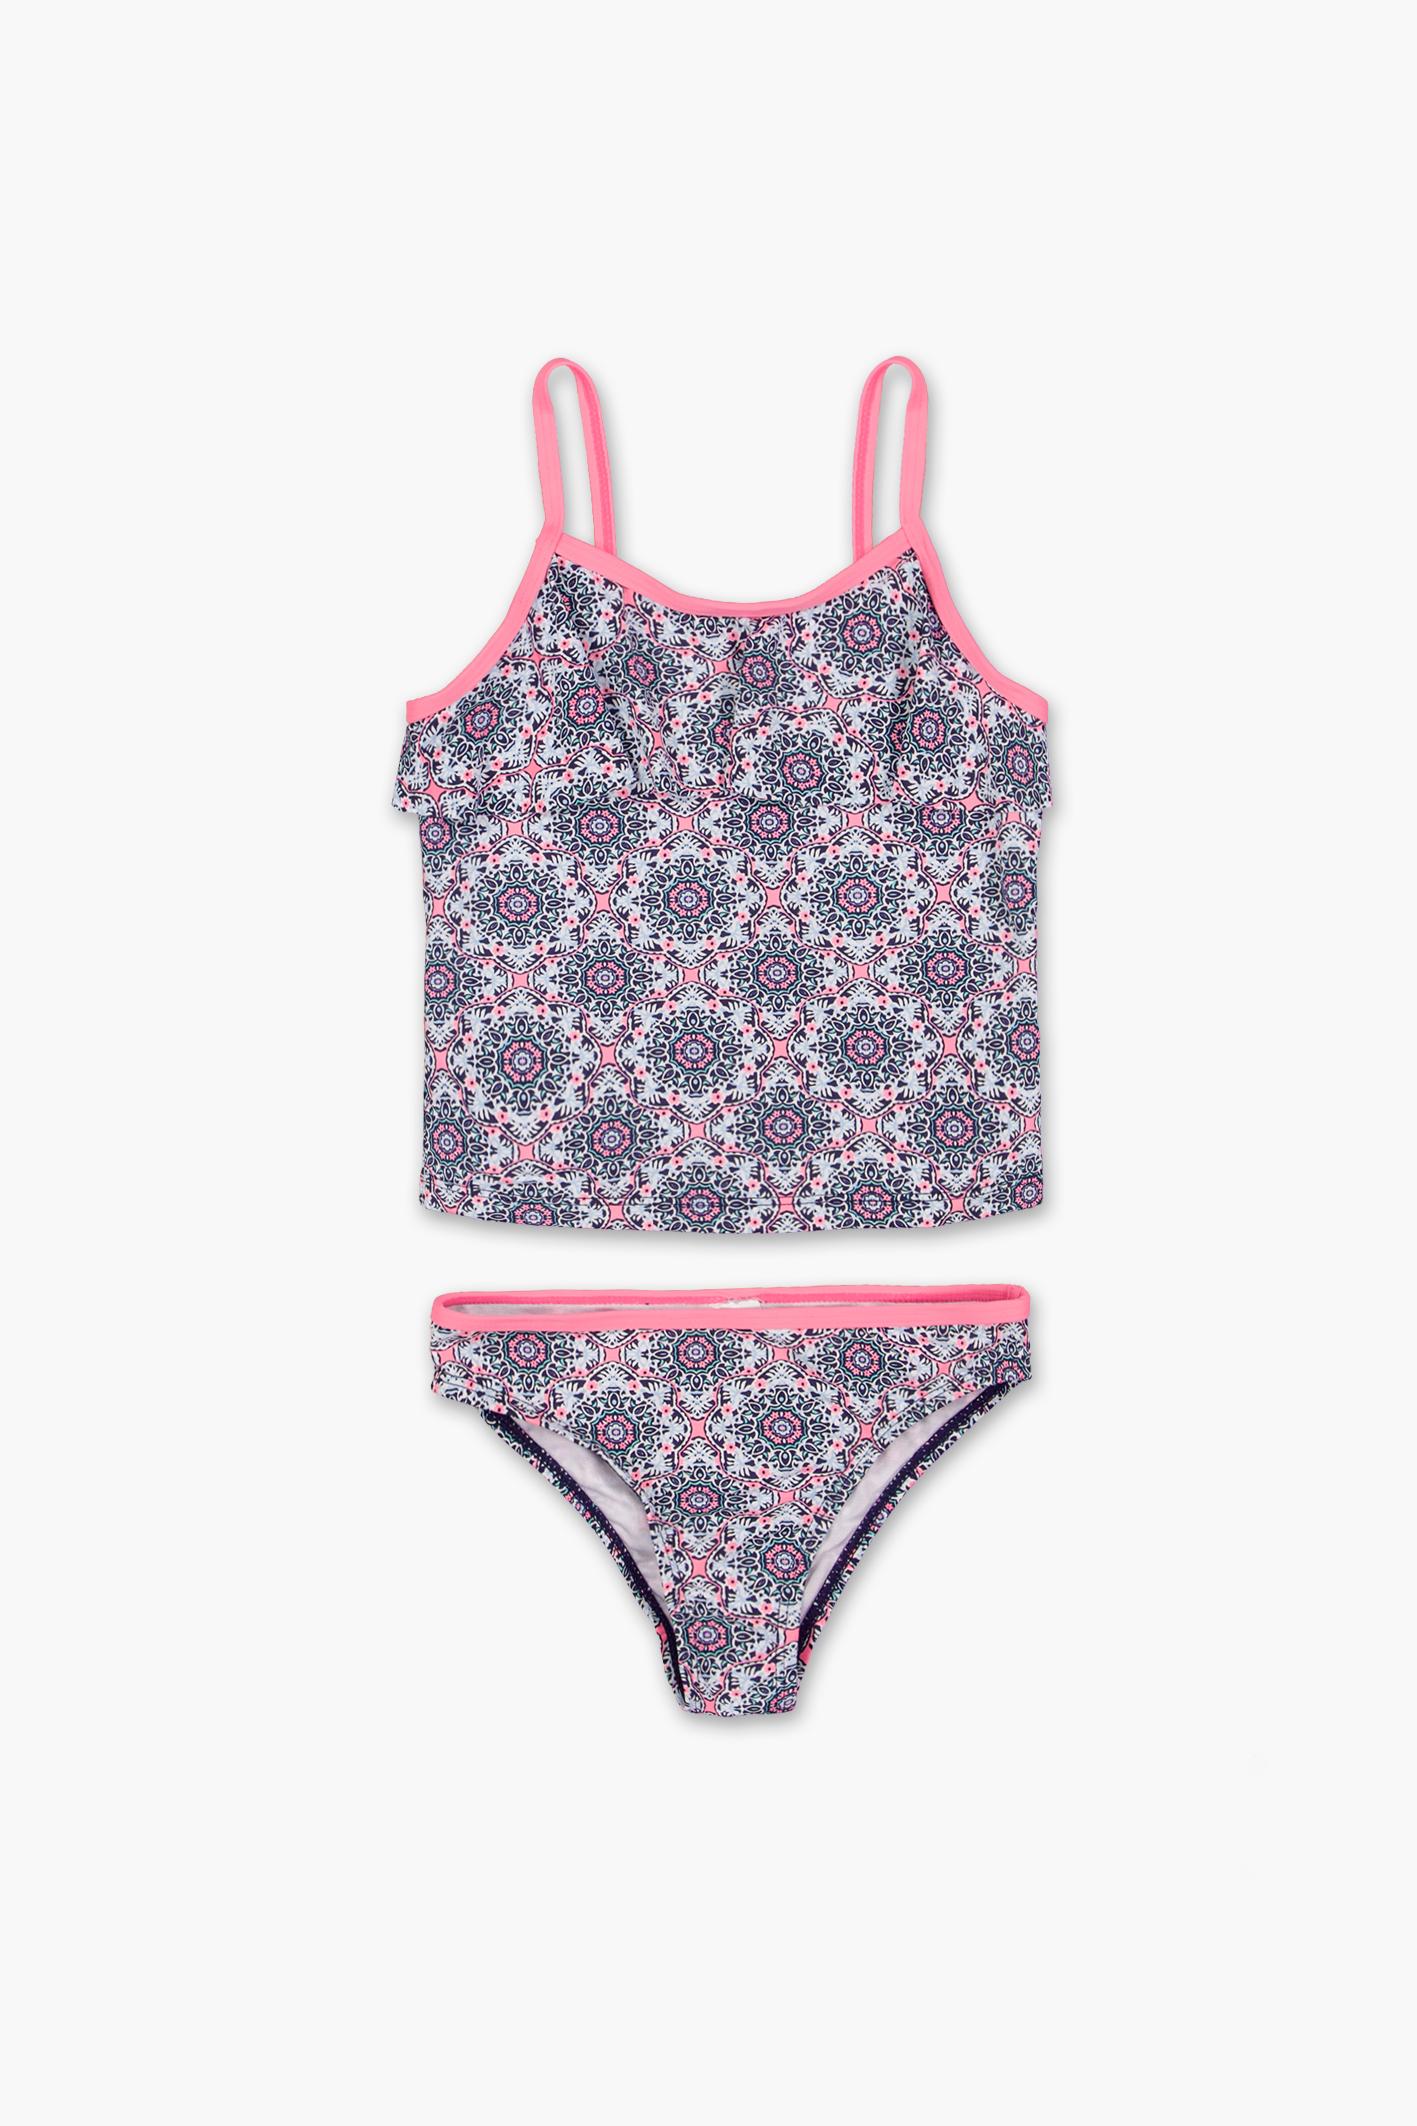 cheeky_tb-bikini-mandala-2-12_07-18-2019__picture-49463